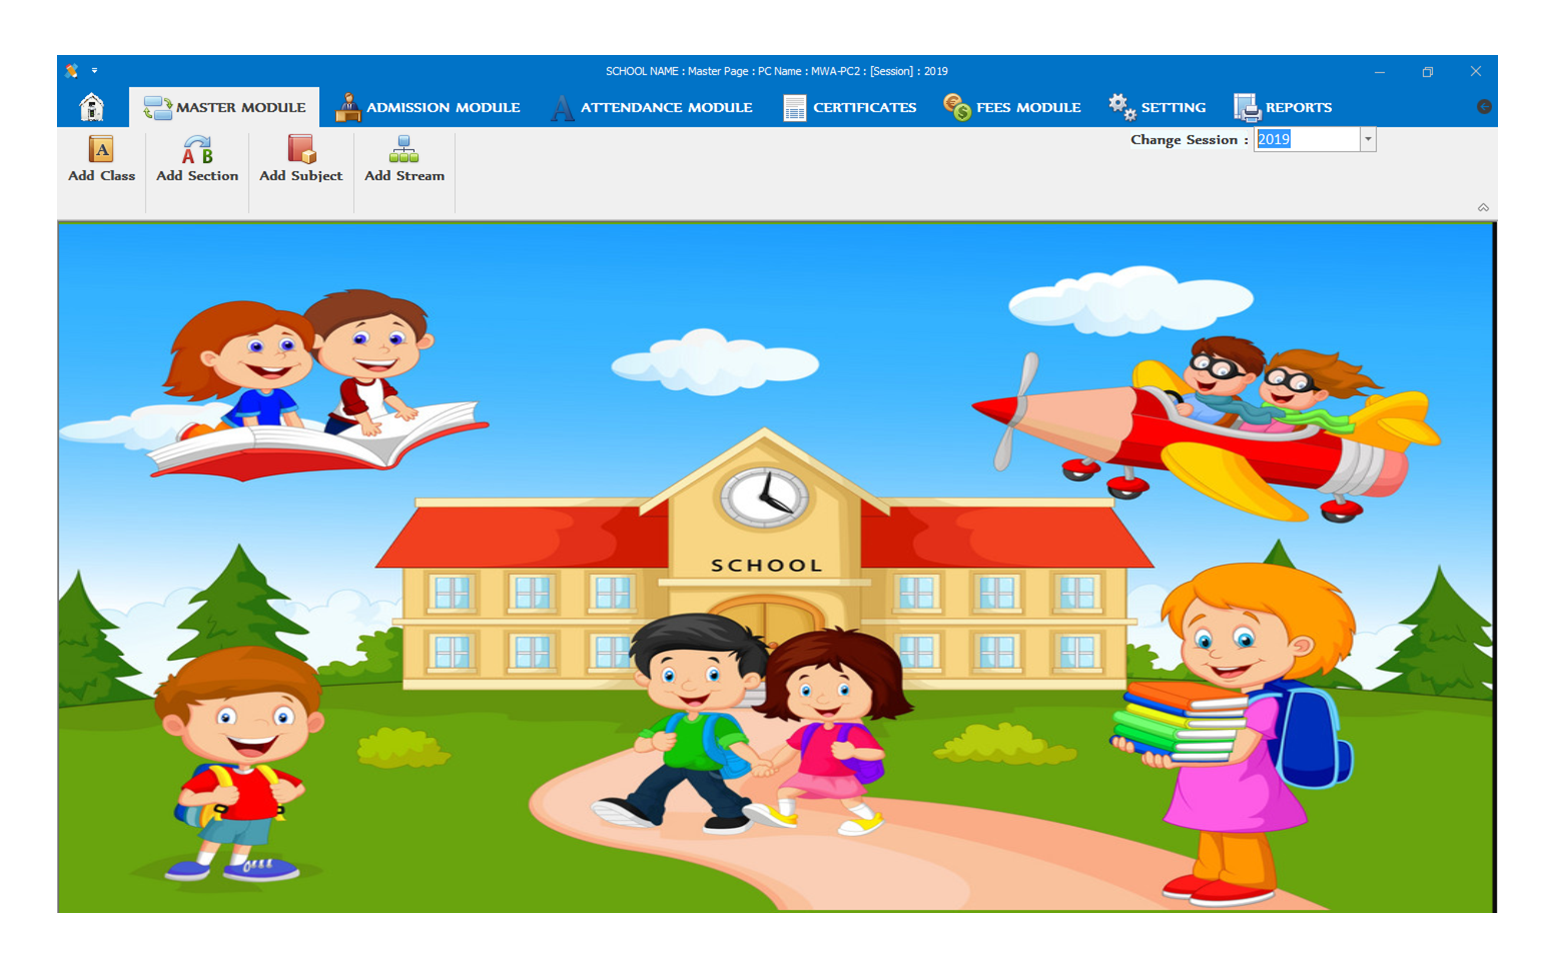 school erp software - MyWebApp Software and Analytics in kota rajasthan